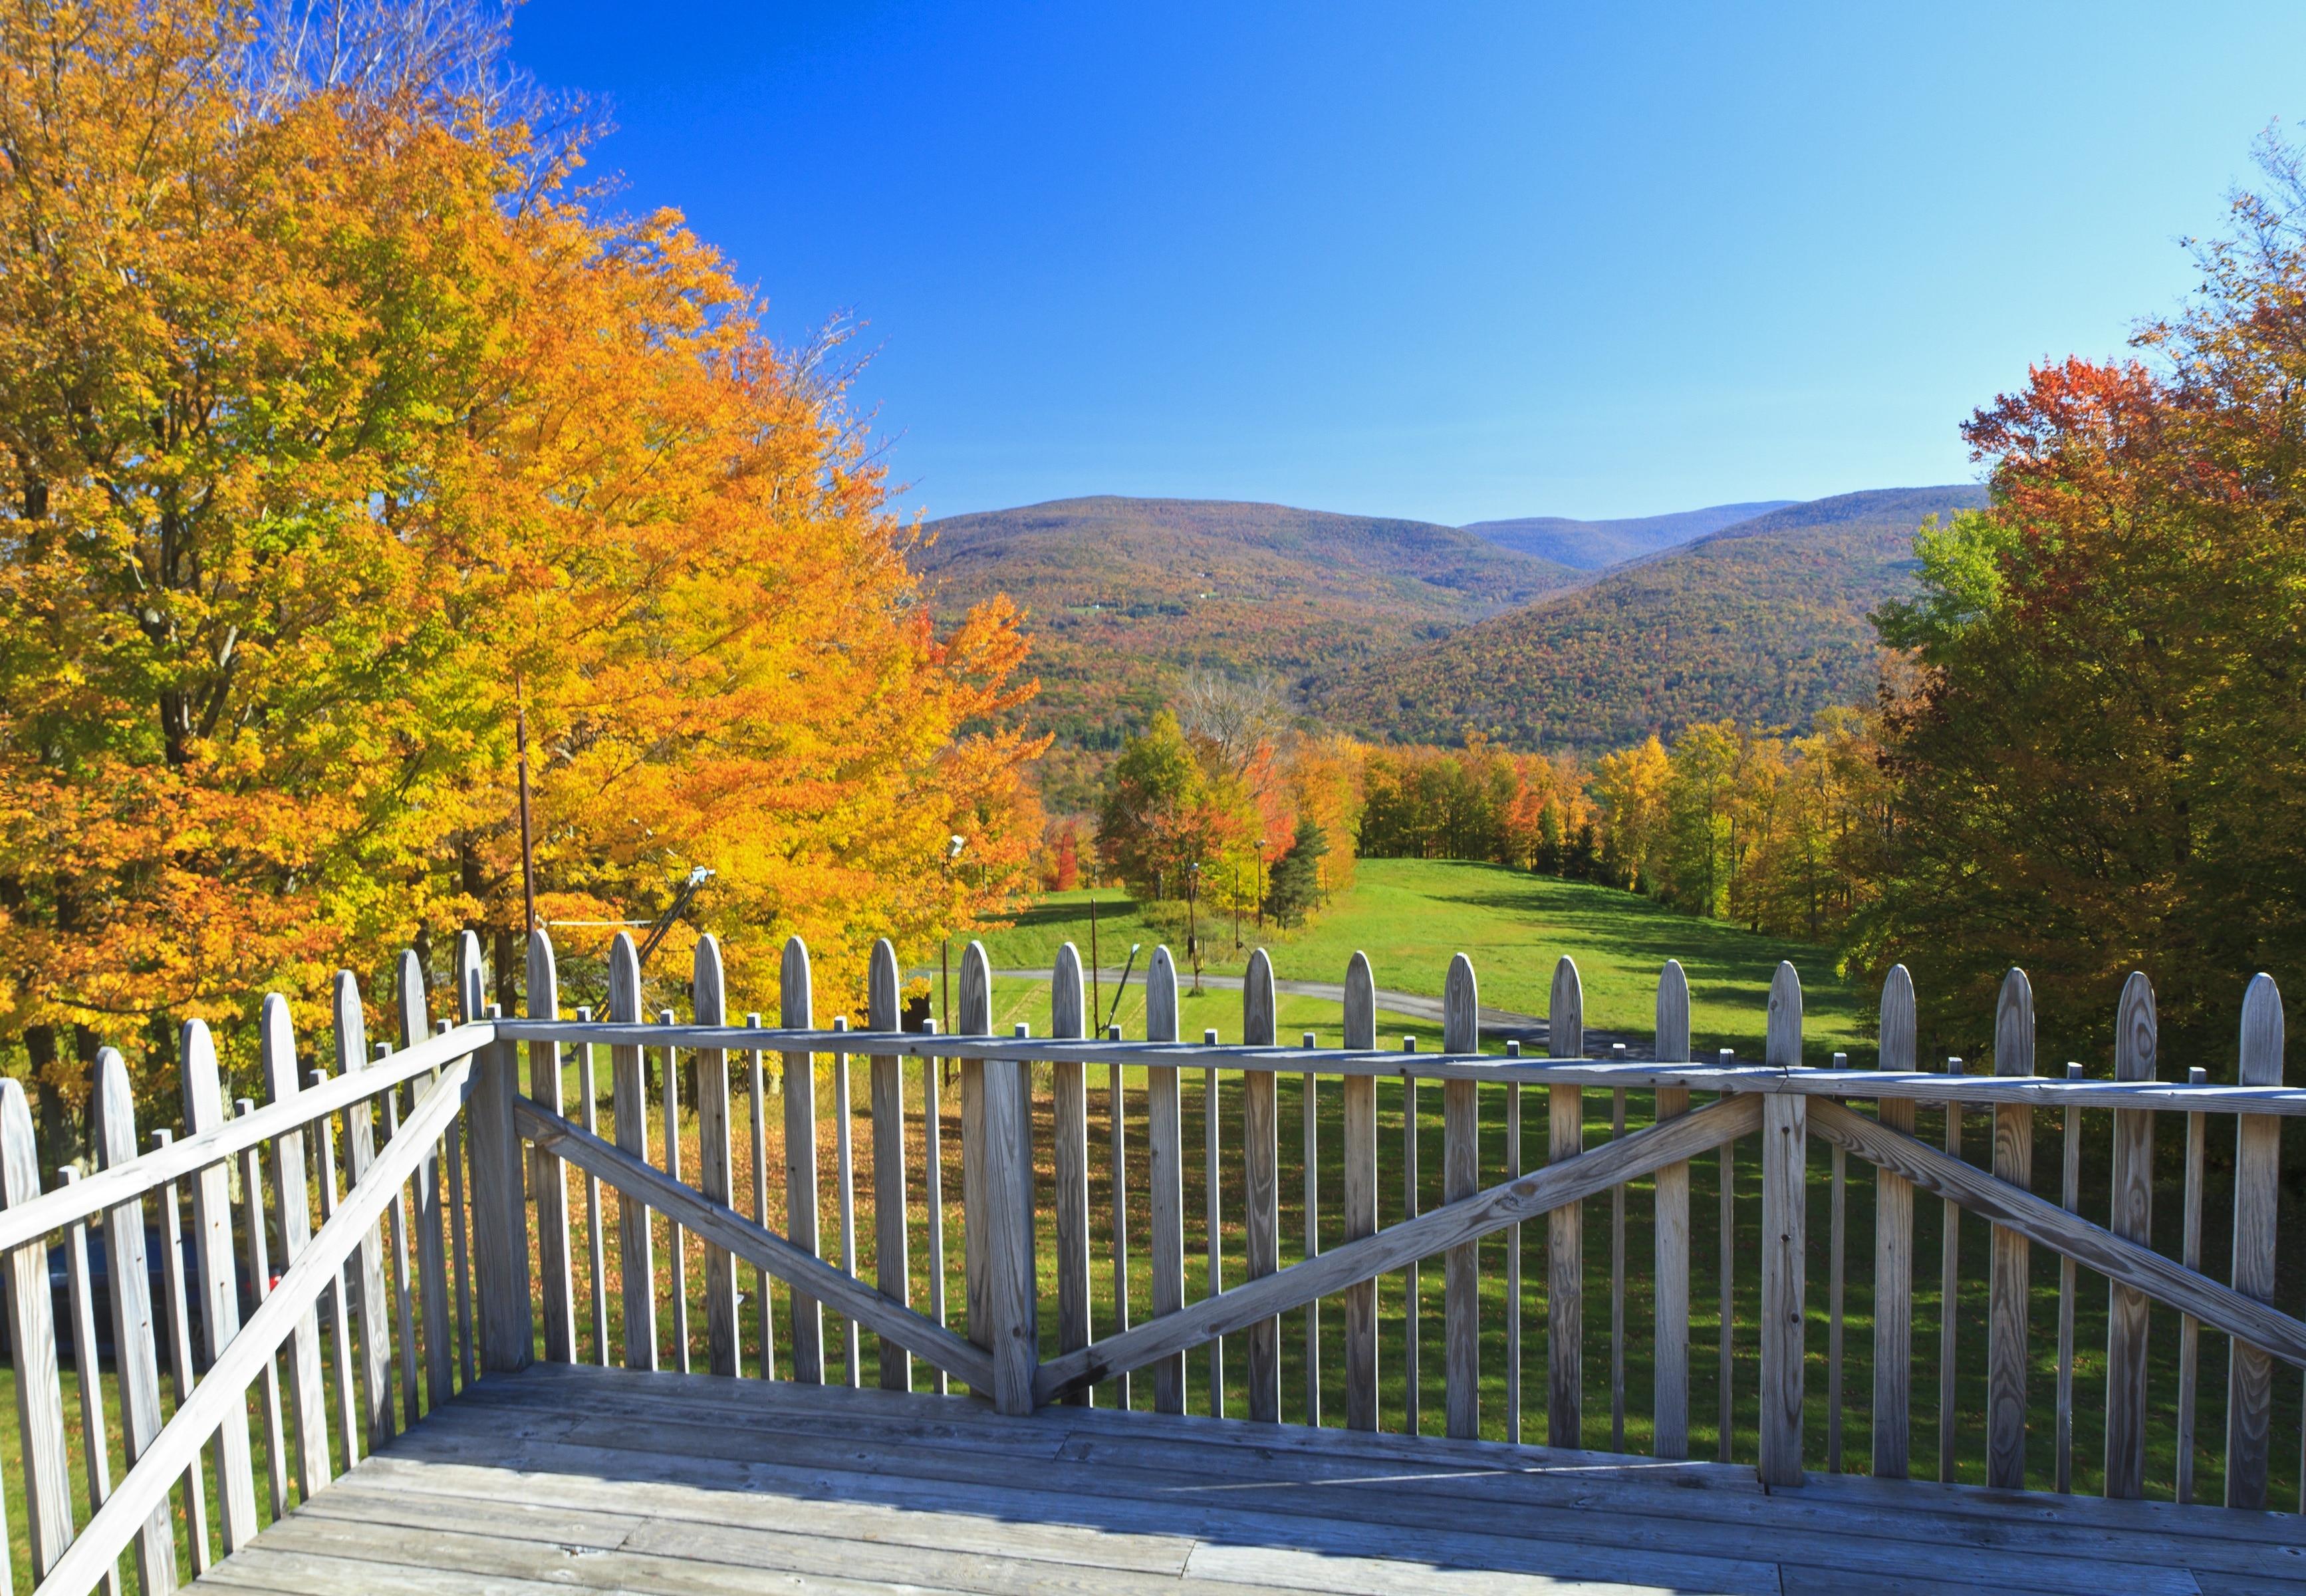 Belleayre Mountain, Highmount, New York, United States of America